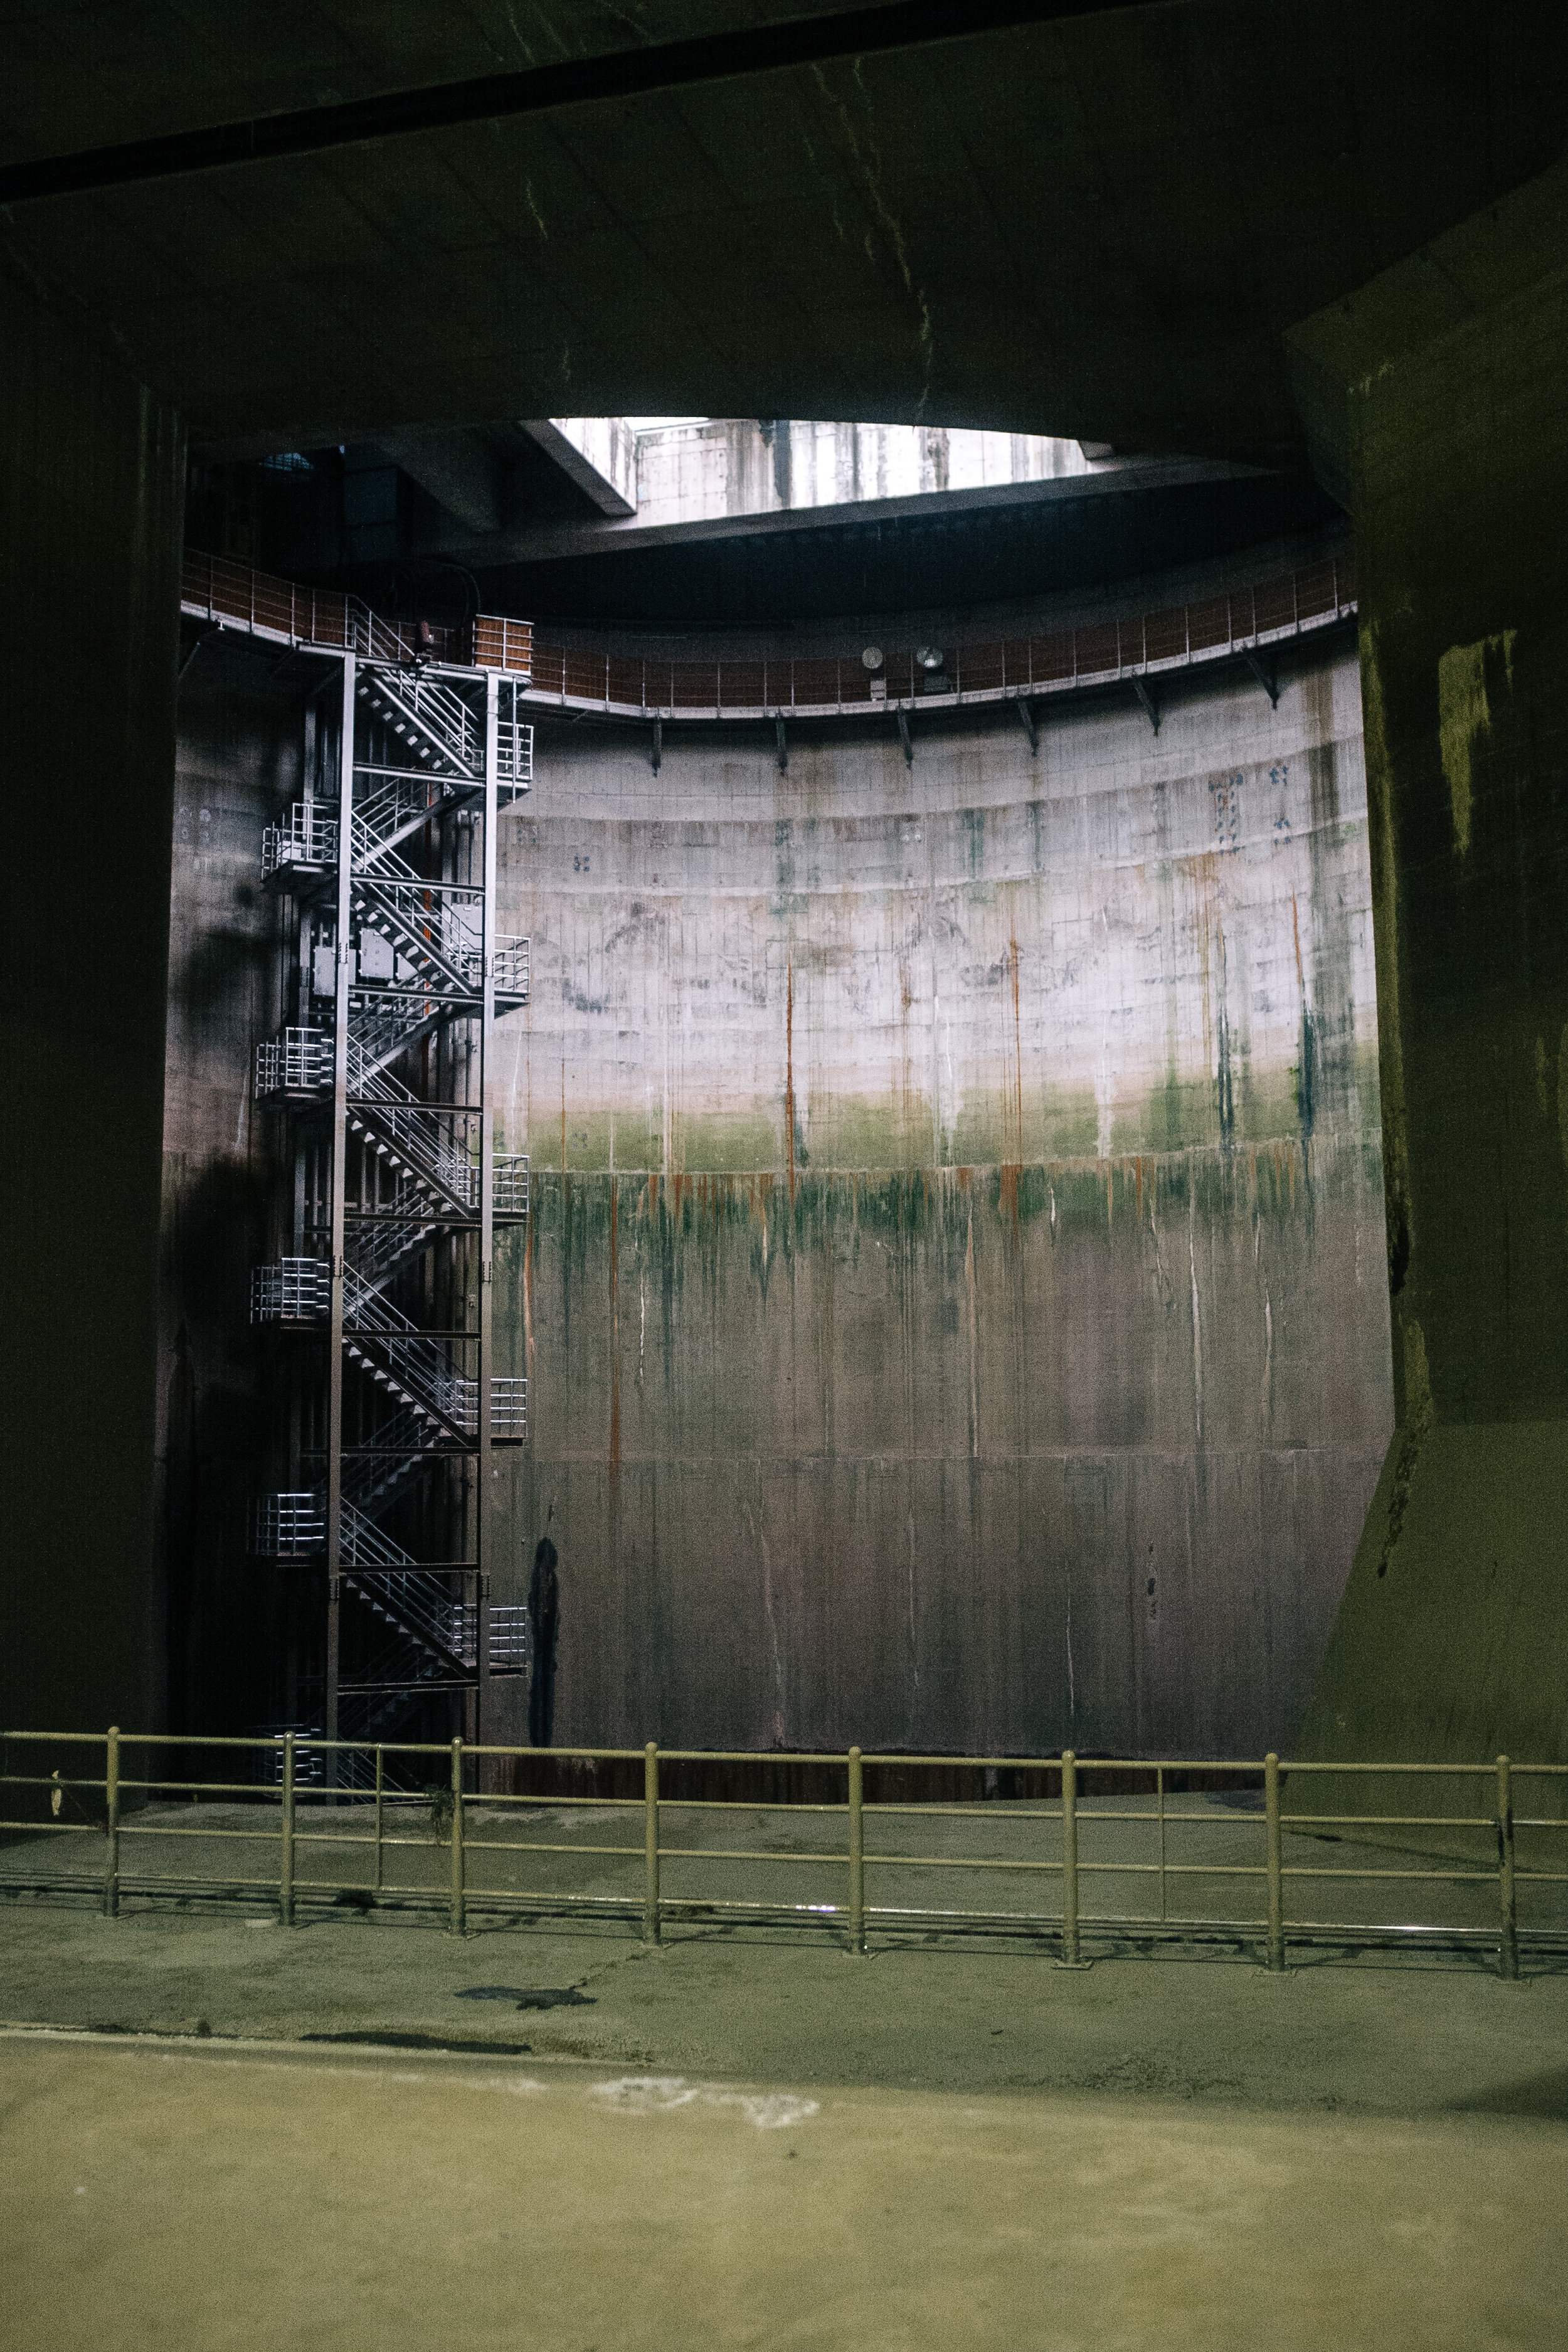 Metropolitan Area Outer Underground Discharge Channel 17.jpg